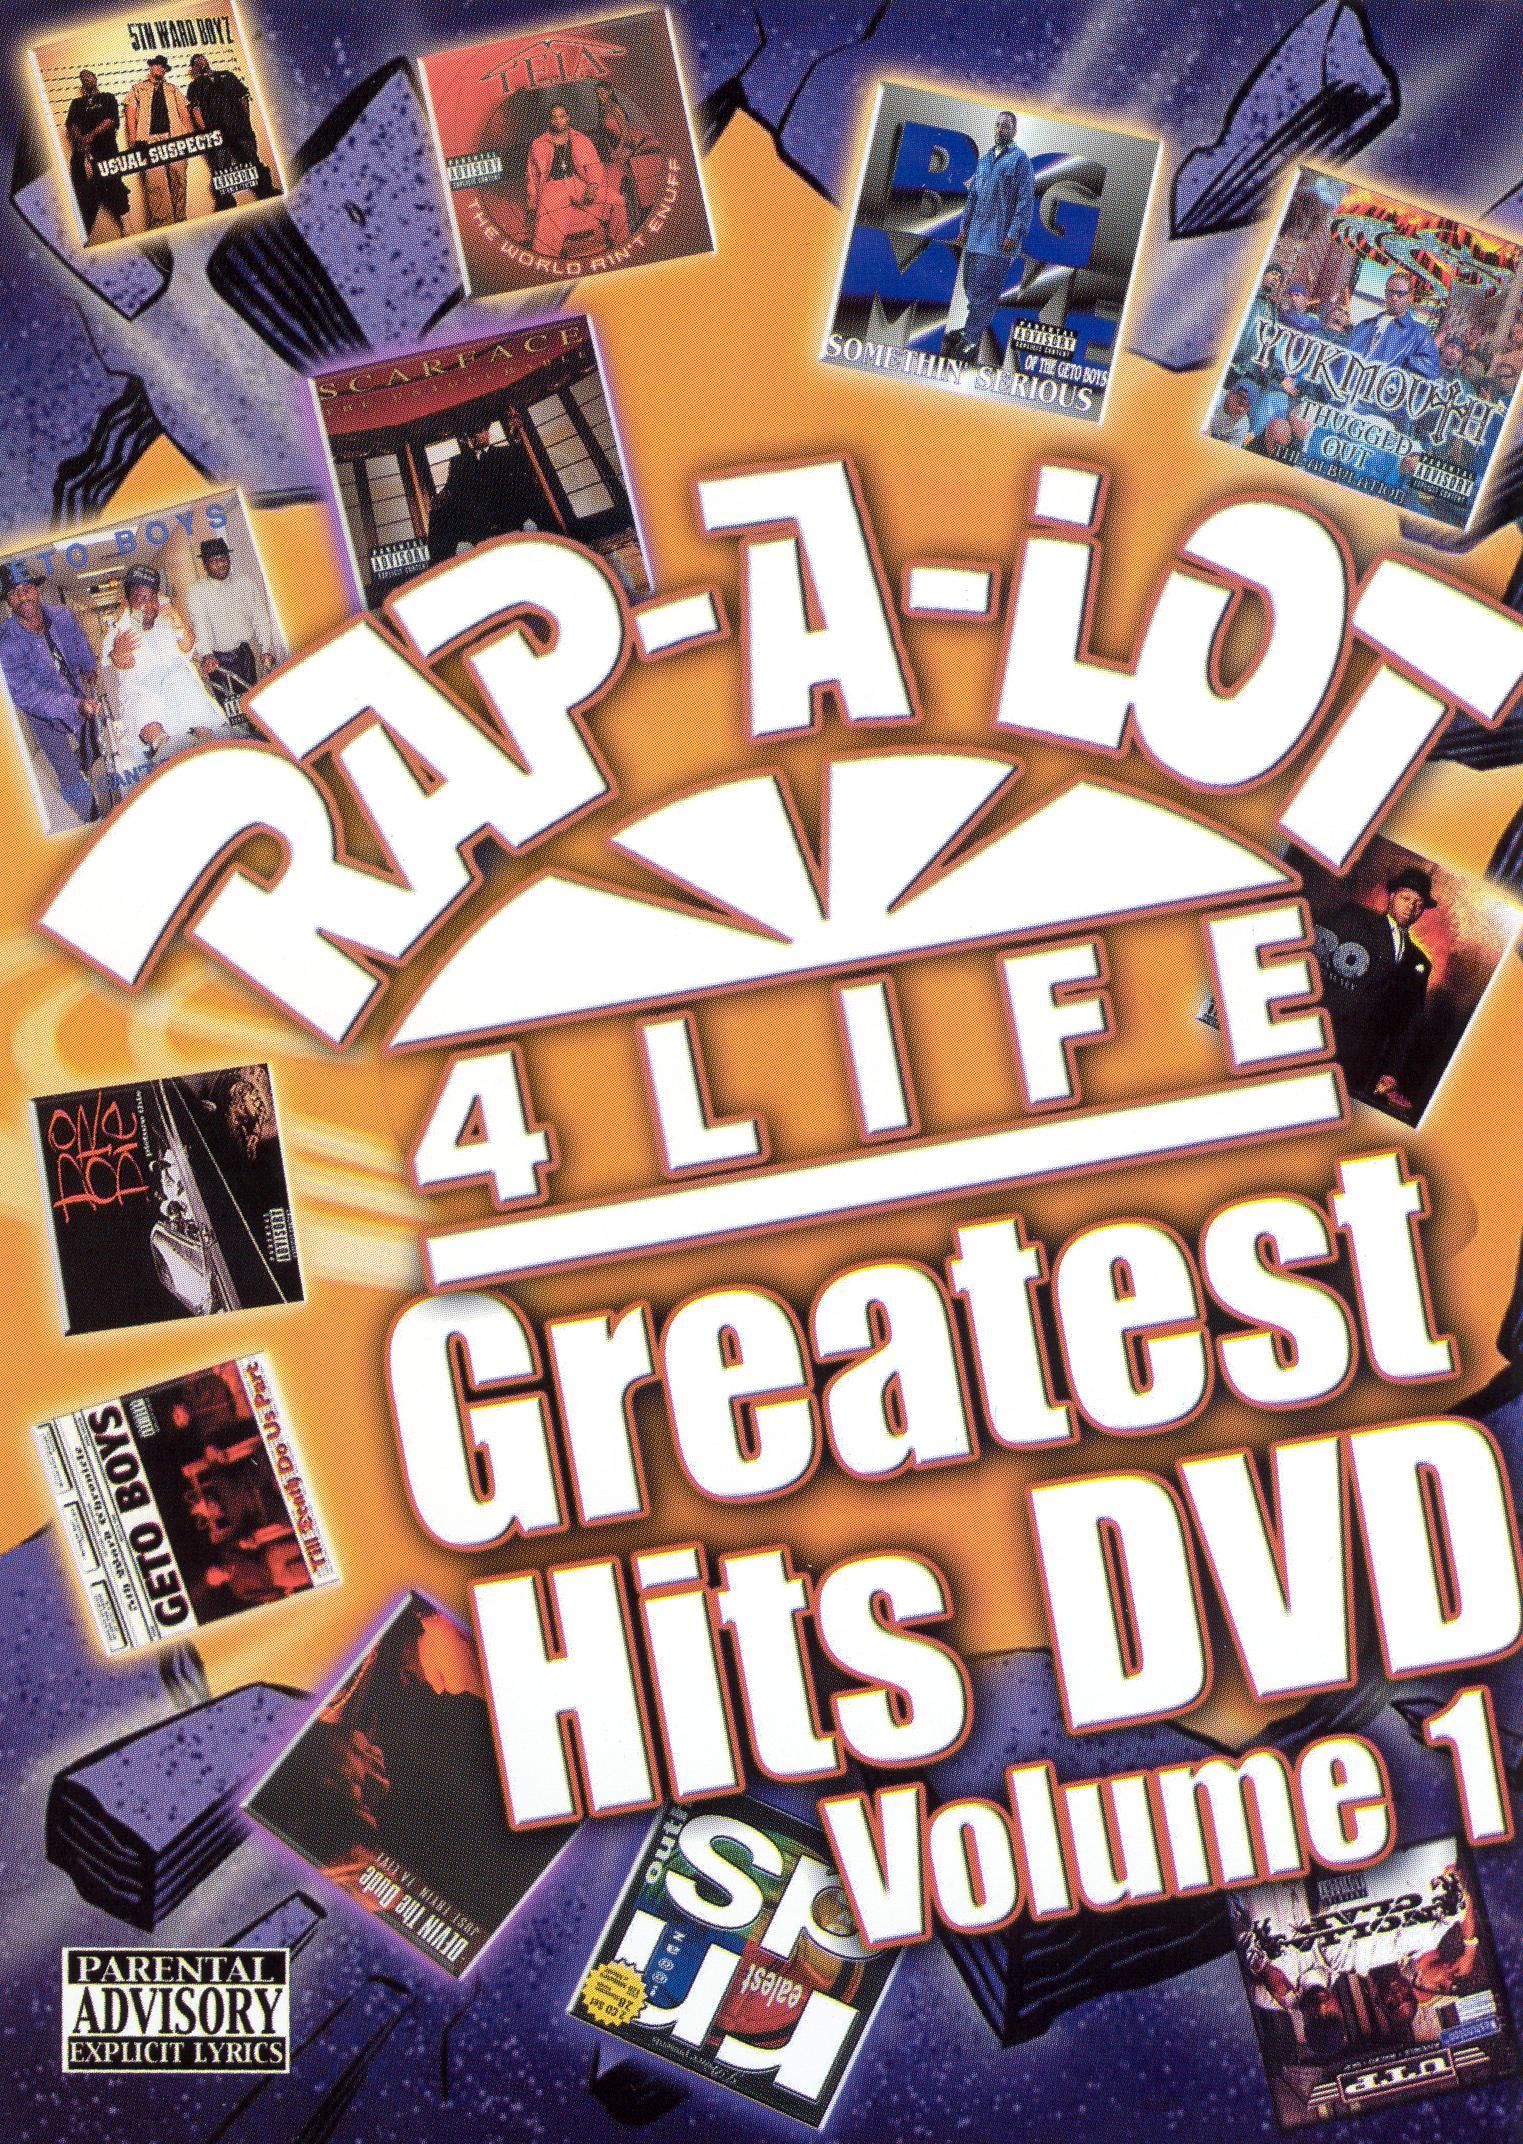 Rap-a-lot Greatest Hits Dvd, Vol. 1 7290656